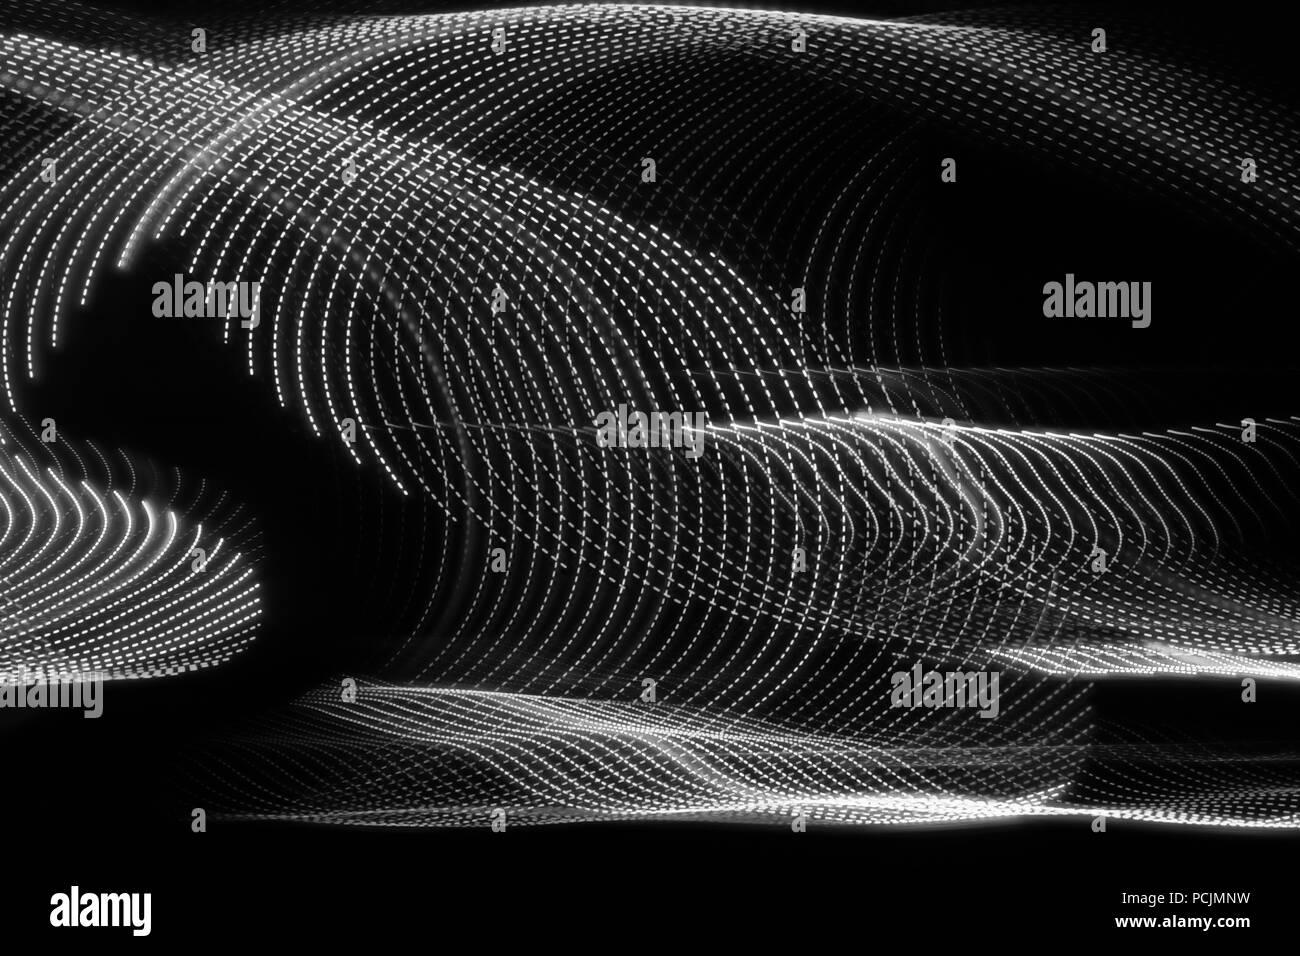 white swirls on black - Stock Image